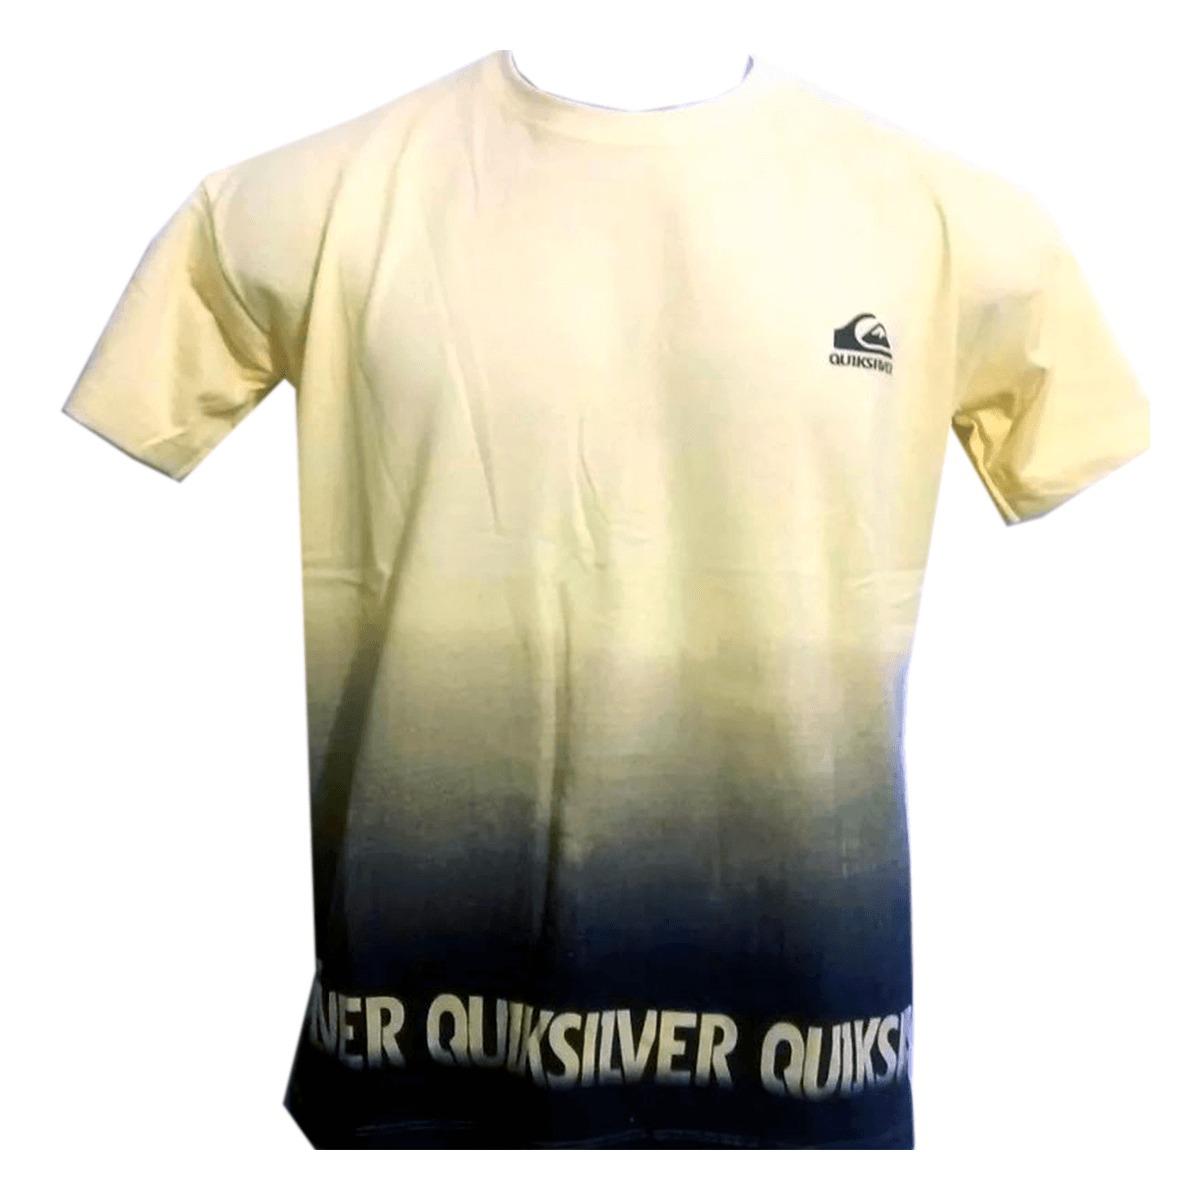 5042ce011d Kit 50 Camisa Camiseta Masculina Marca Cor Degrade Top - R  420